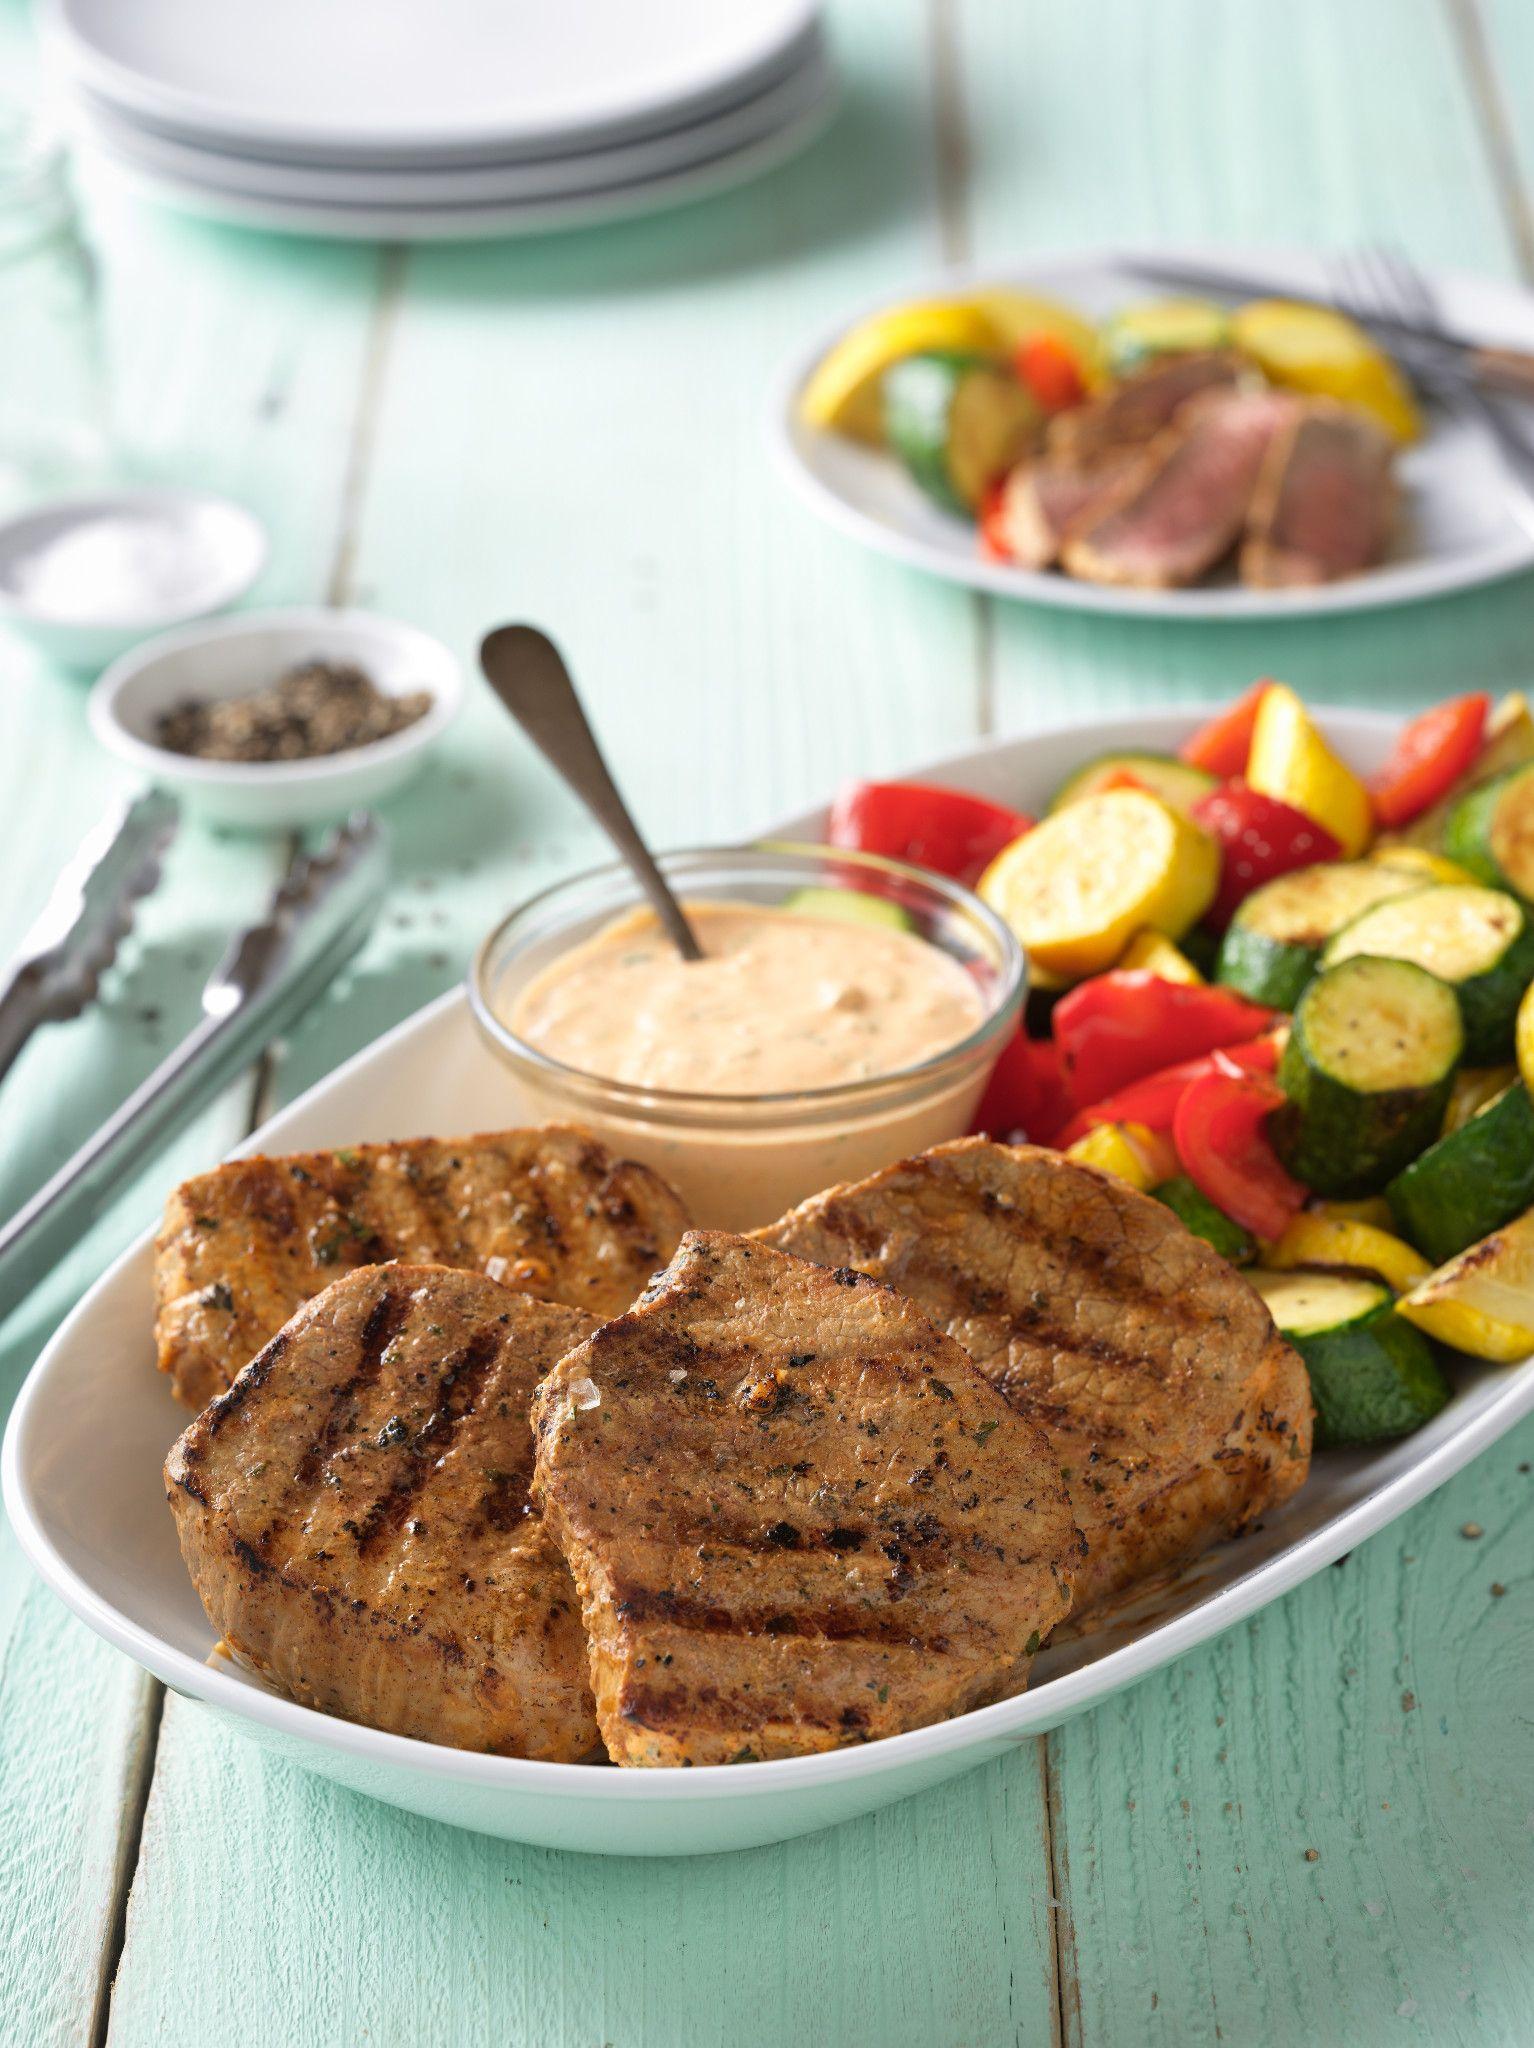 Eye of Round Steaks with Garlic-Yogurt Marinade